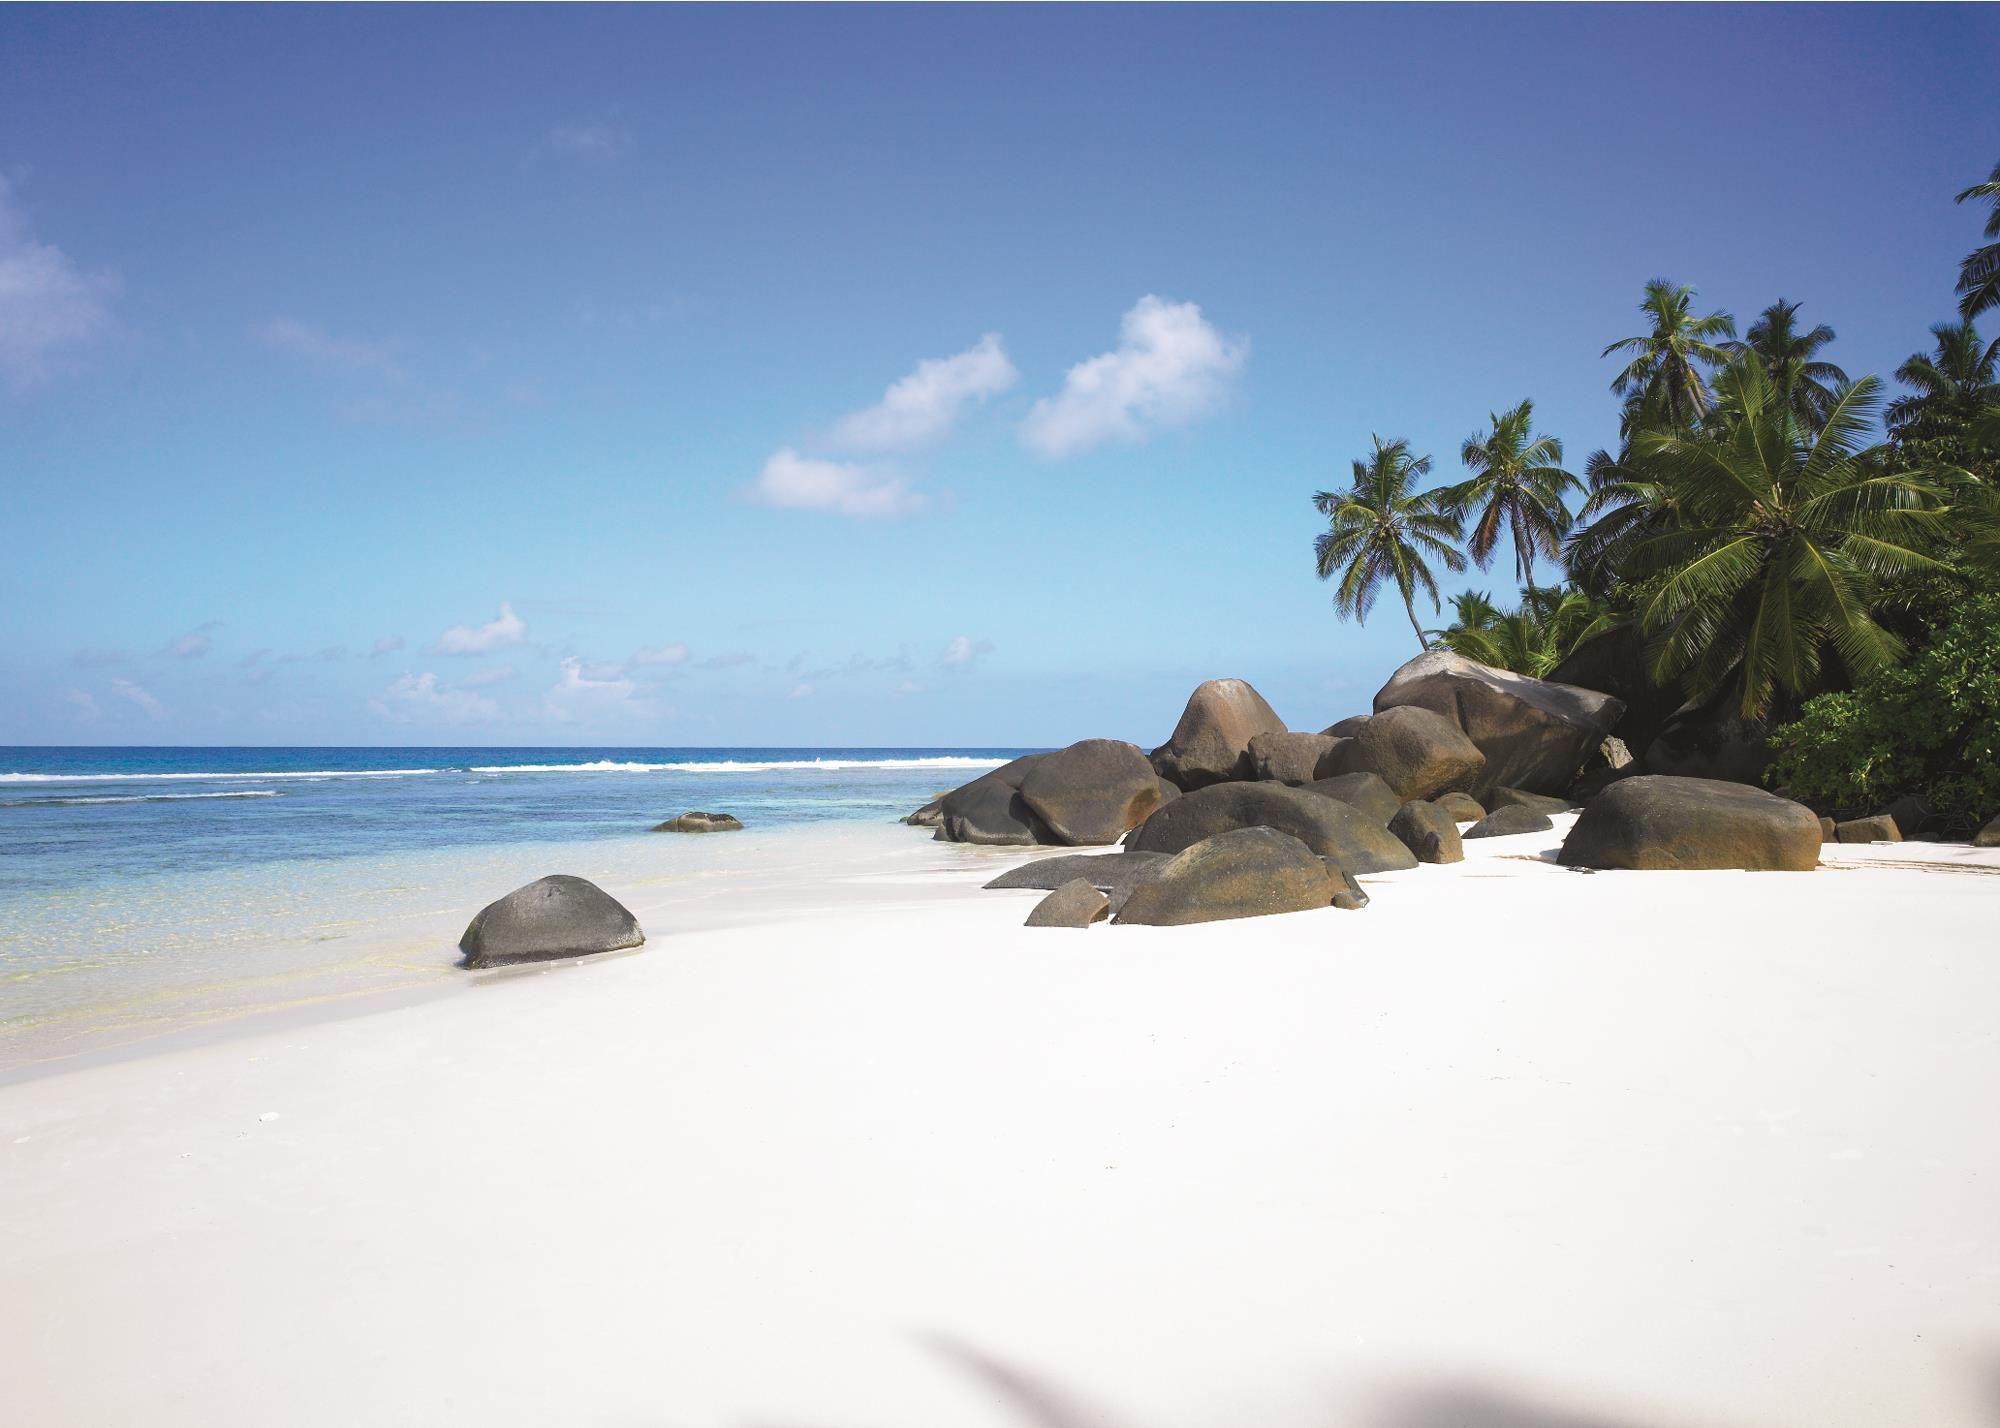 Hd Paradise White S Beach Seychelles Wallpaper, Palm - Seychelles Hilton Labriz Beach , HD Wallpaper & Backgrounds